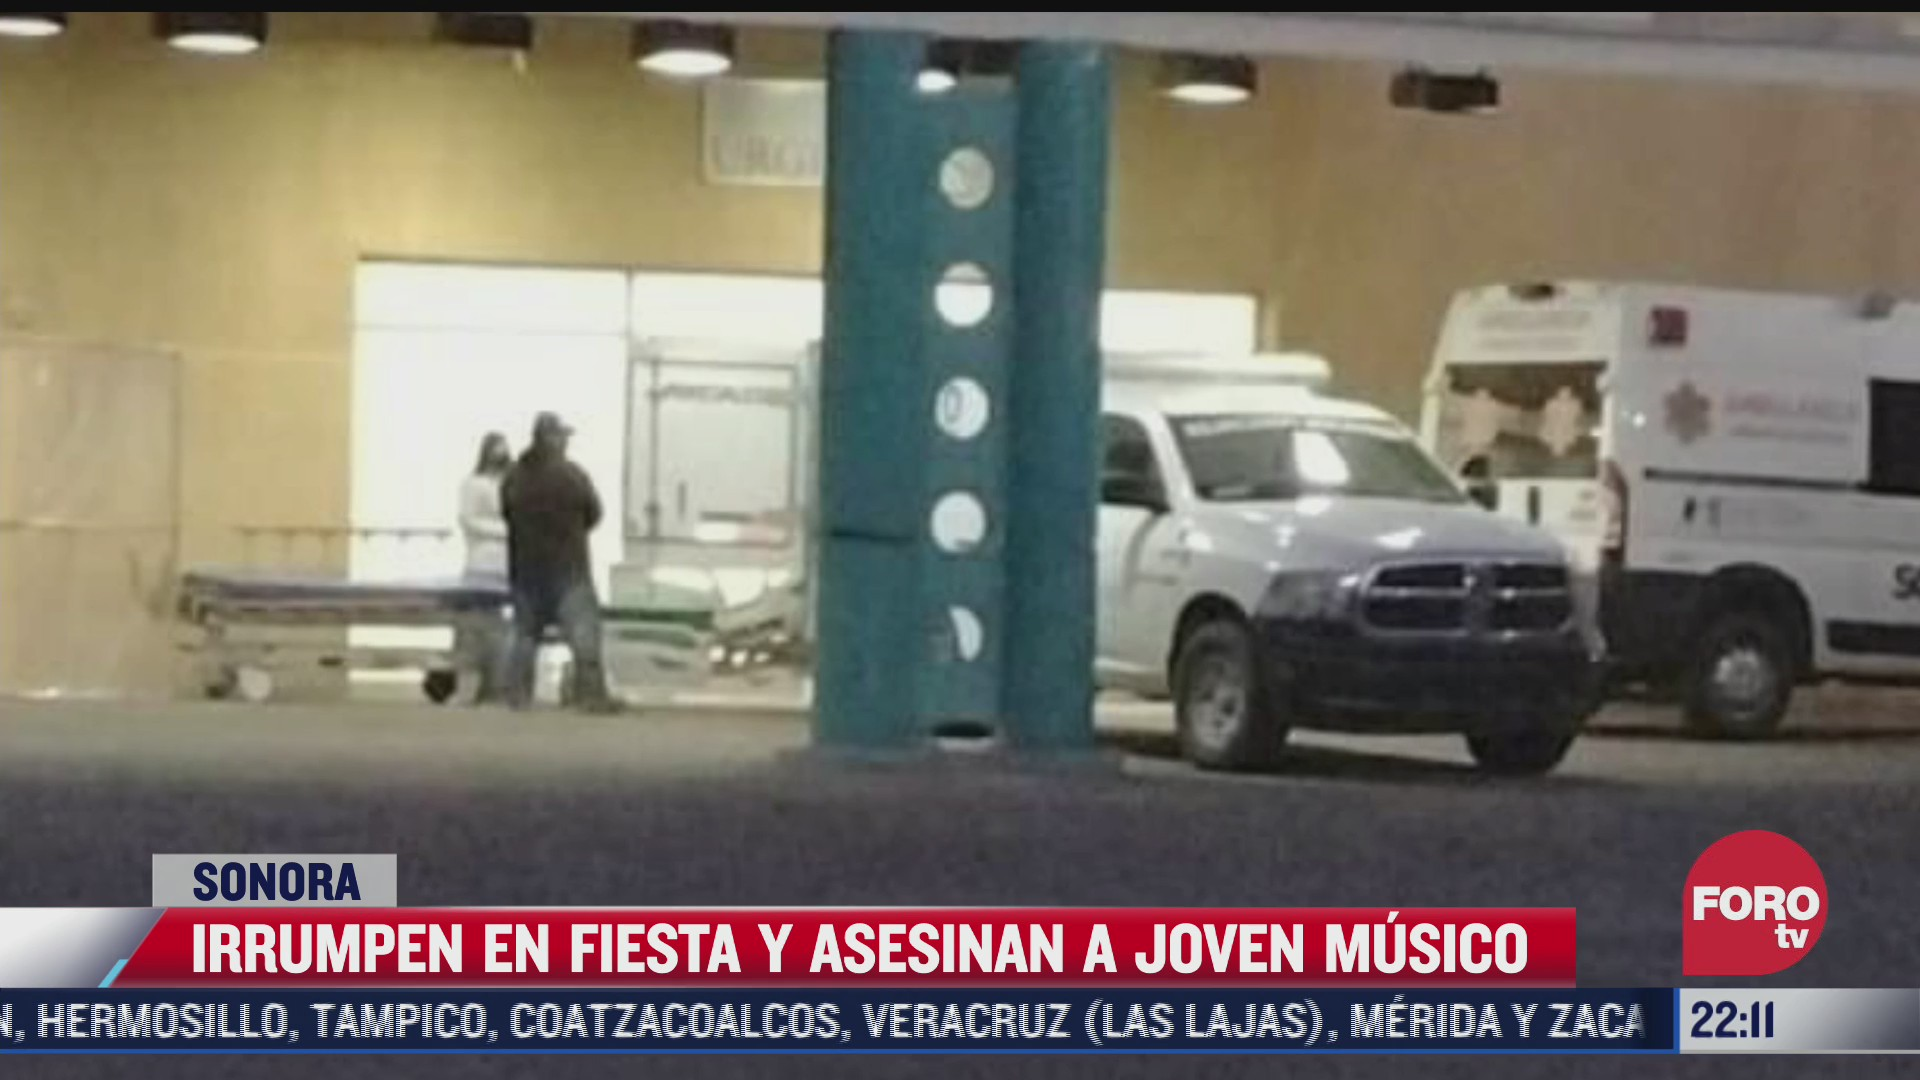 asesinan a joven musico en plena fiesta en sonora